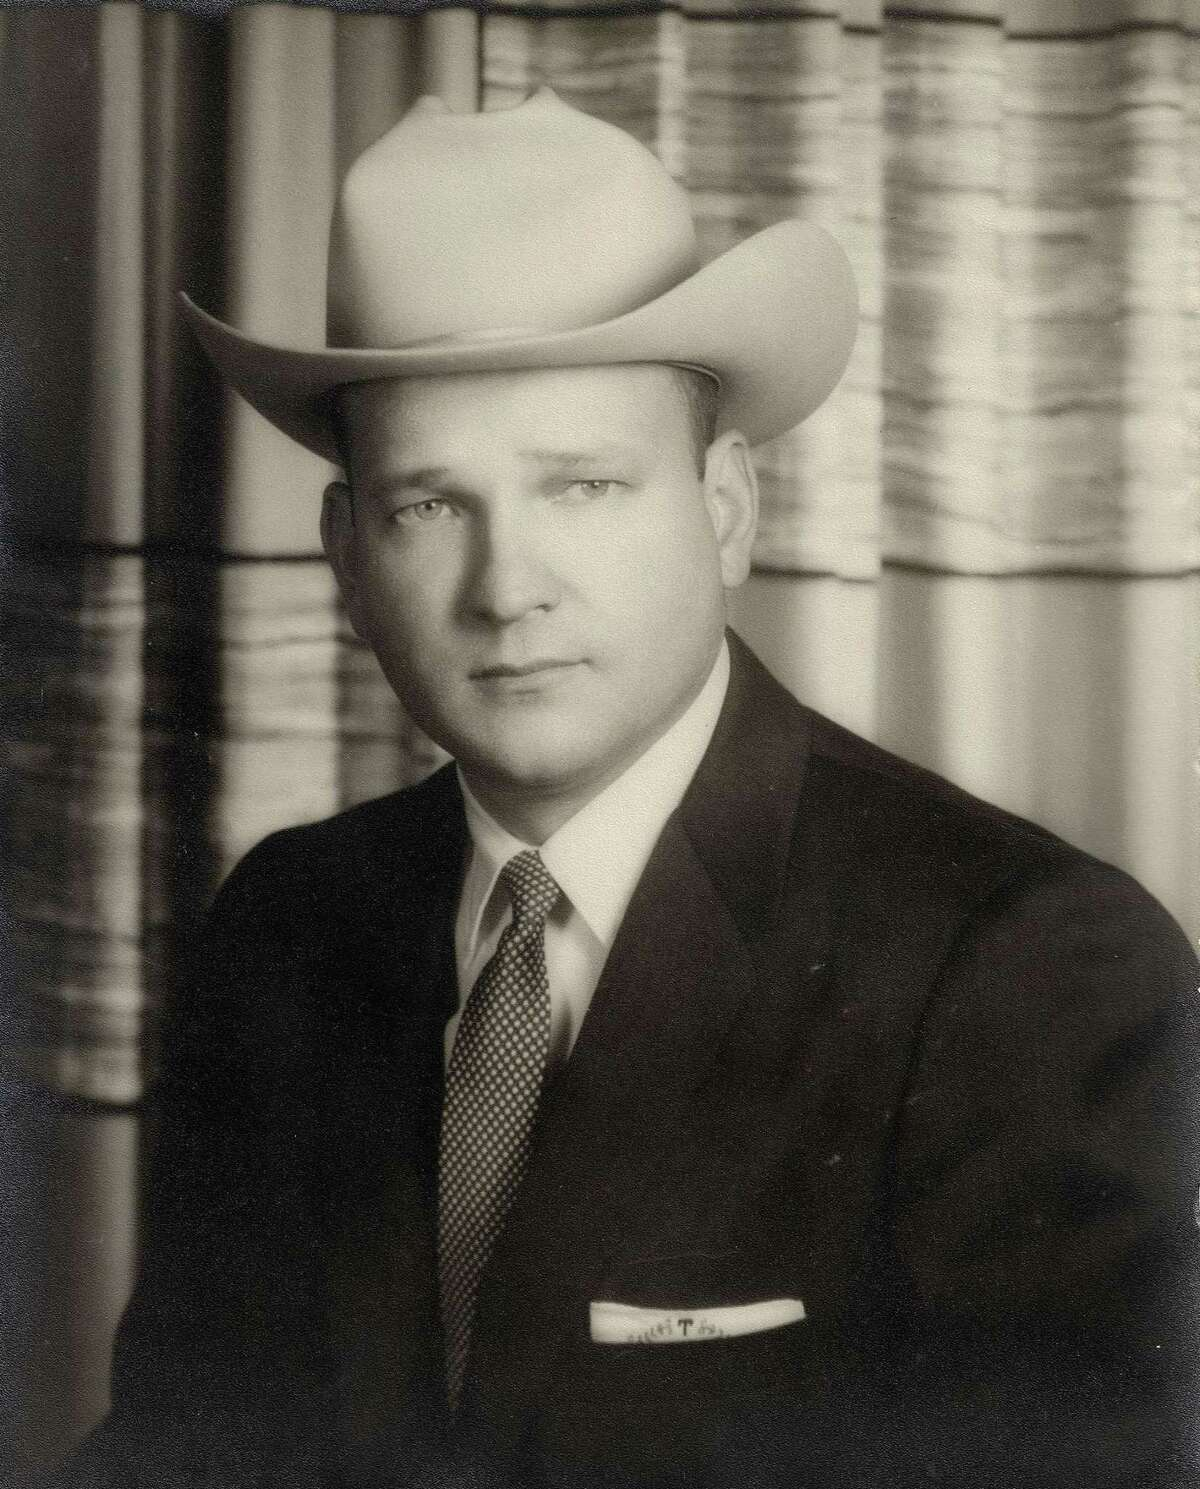 Joe Max Taylor, former Galveston County Sheriff